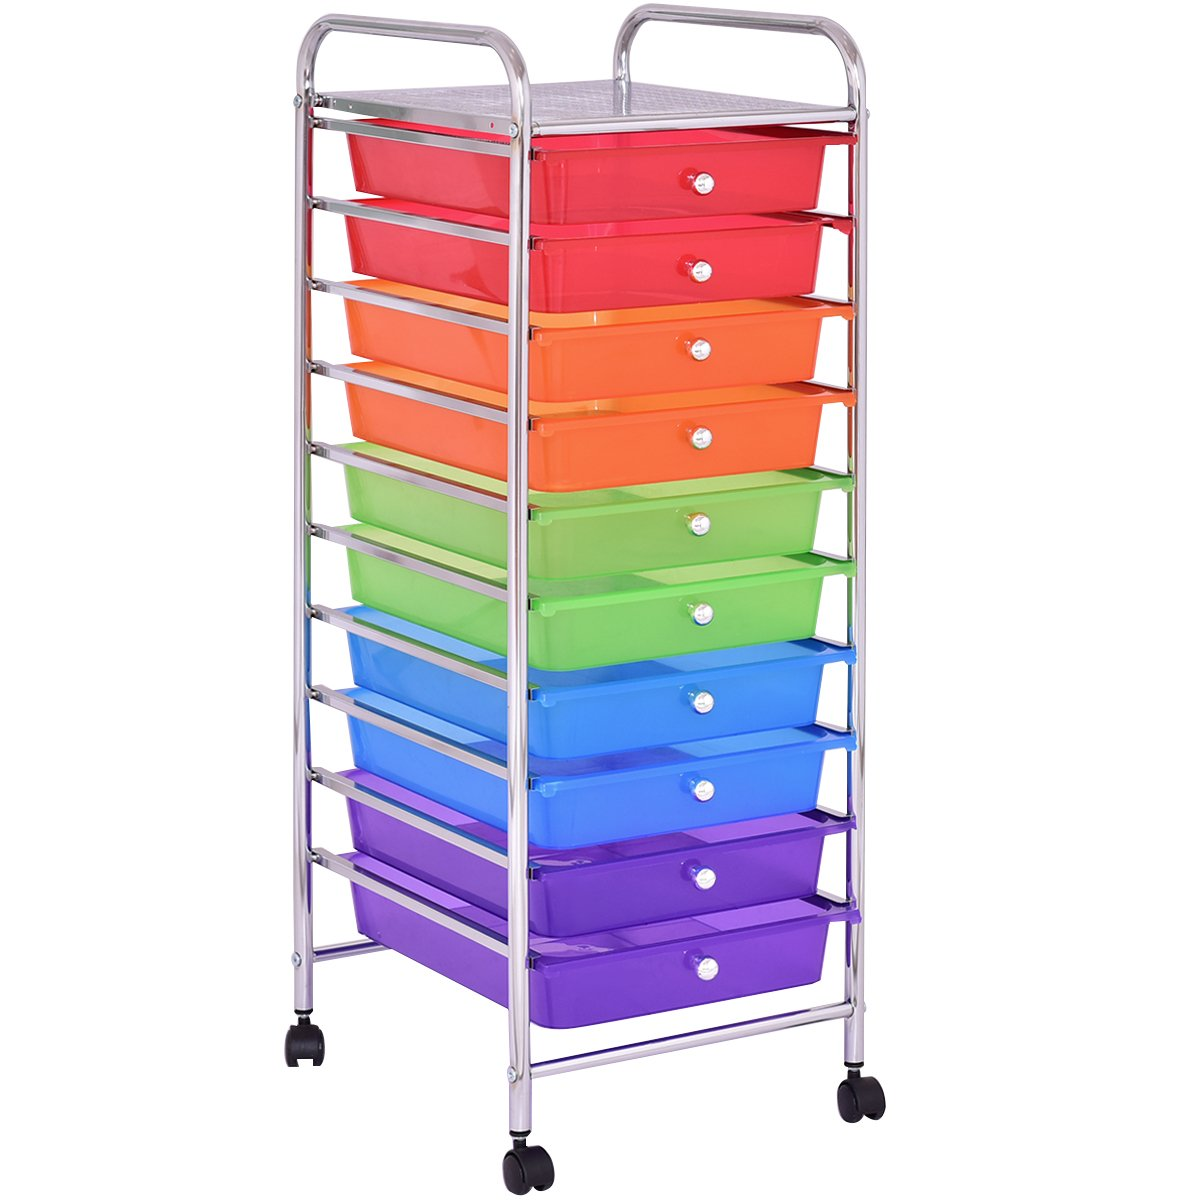 Giantex 10 Drawers Cart Storage Bin Organizer Rolling Storage Cart Metal Frame Plastic Drawers Flexible Wheels Home Office Scrapbook Supply & Paper Shelf, Multicolor